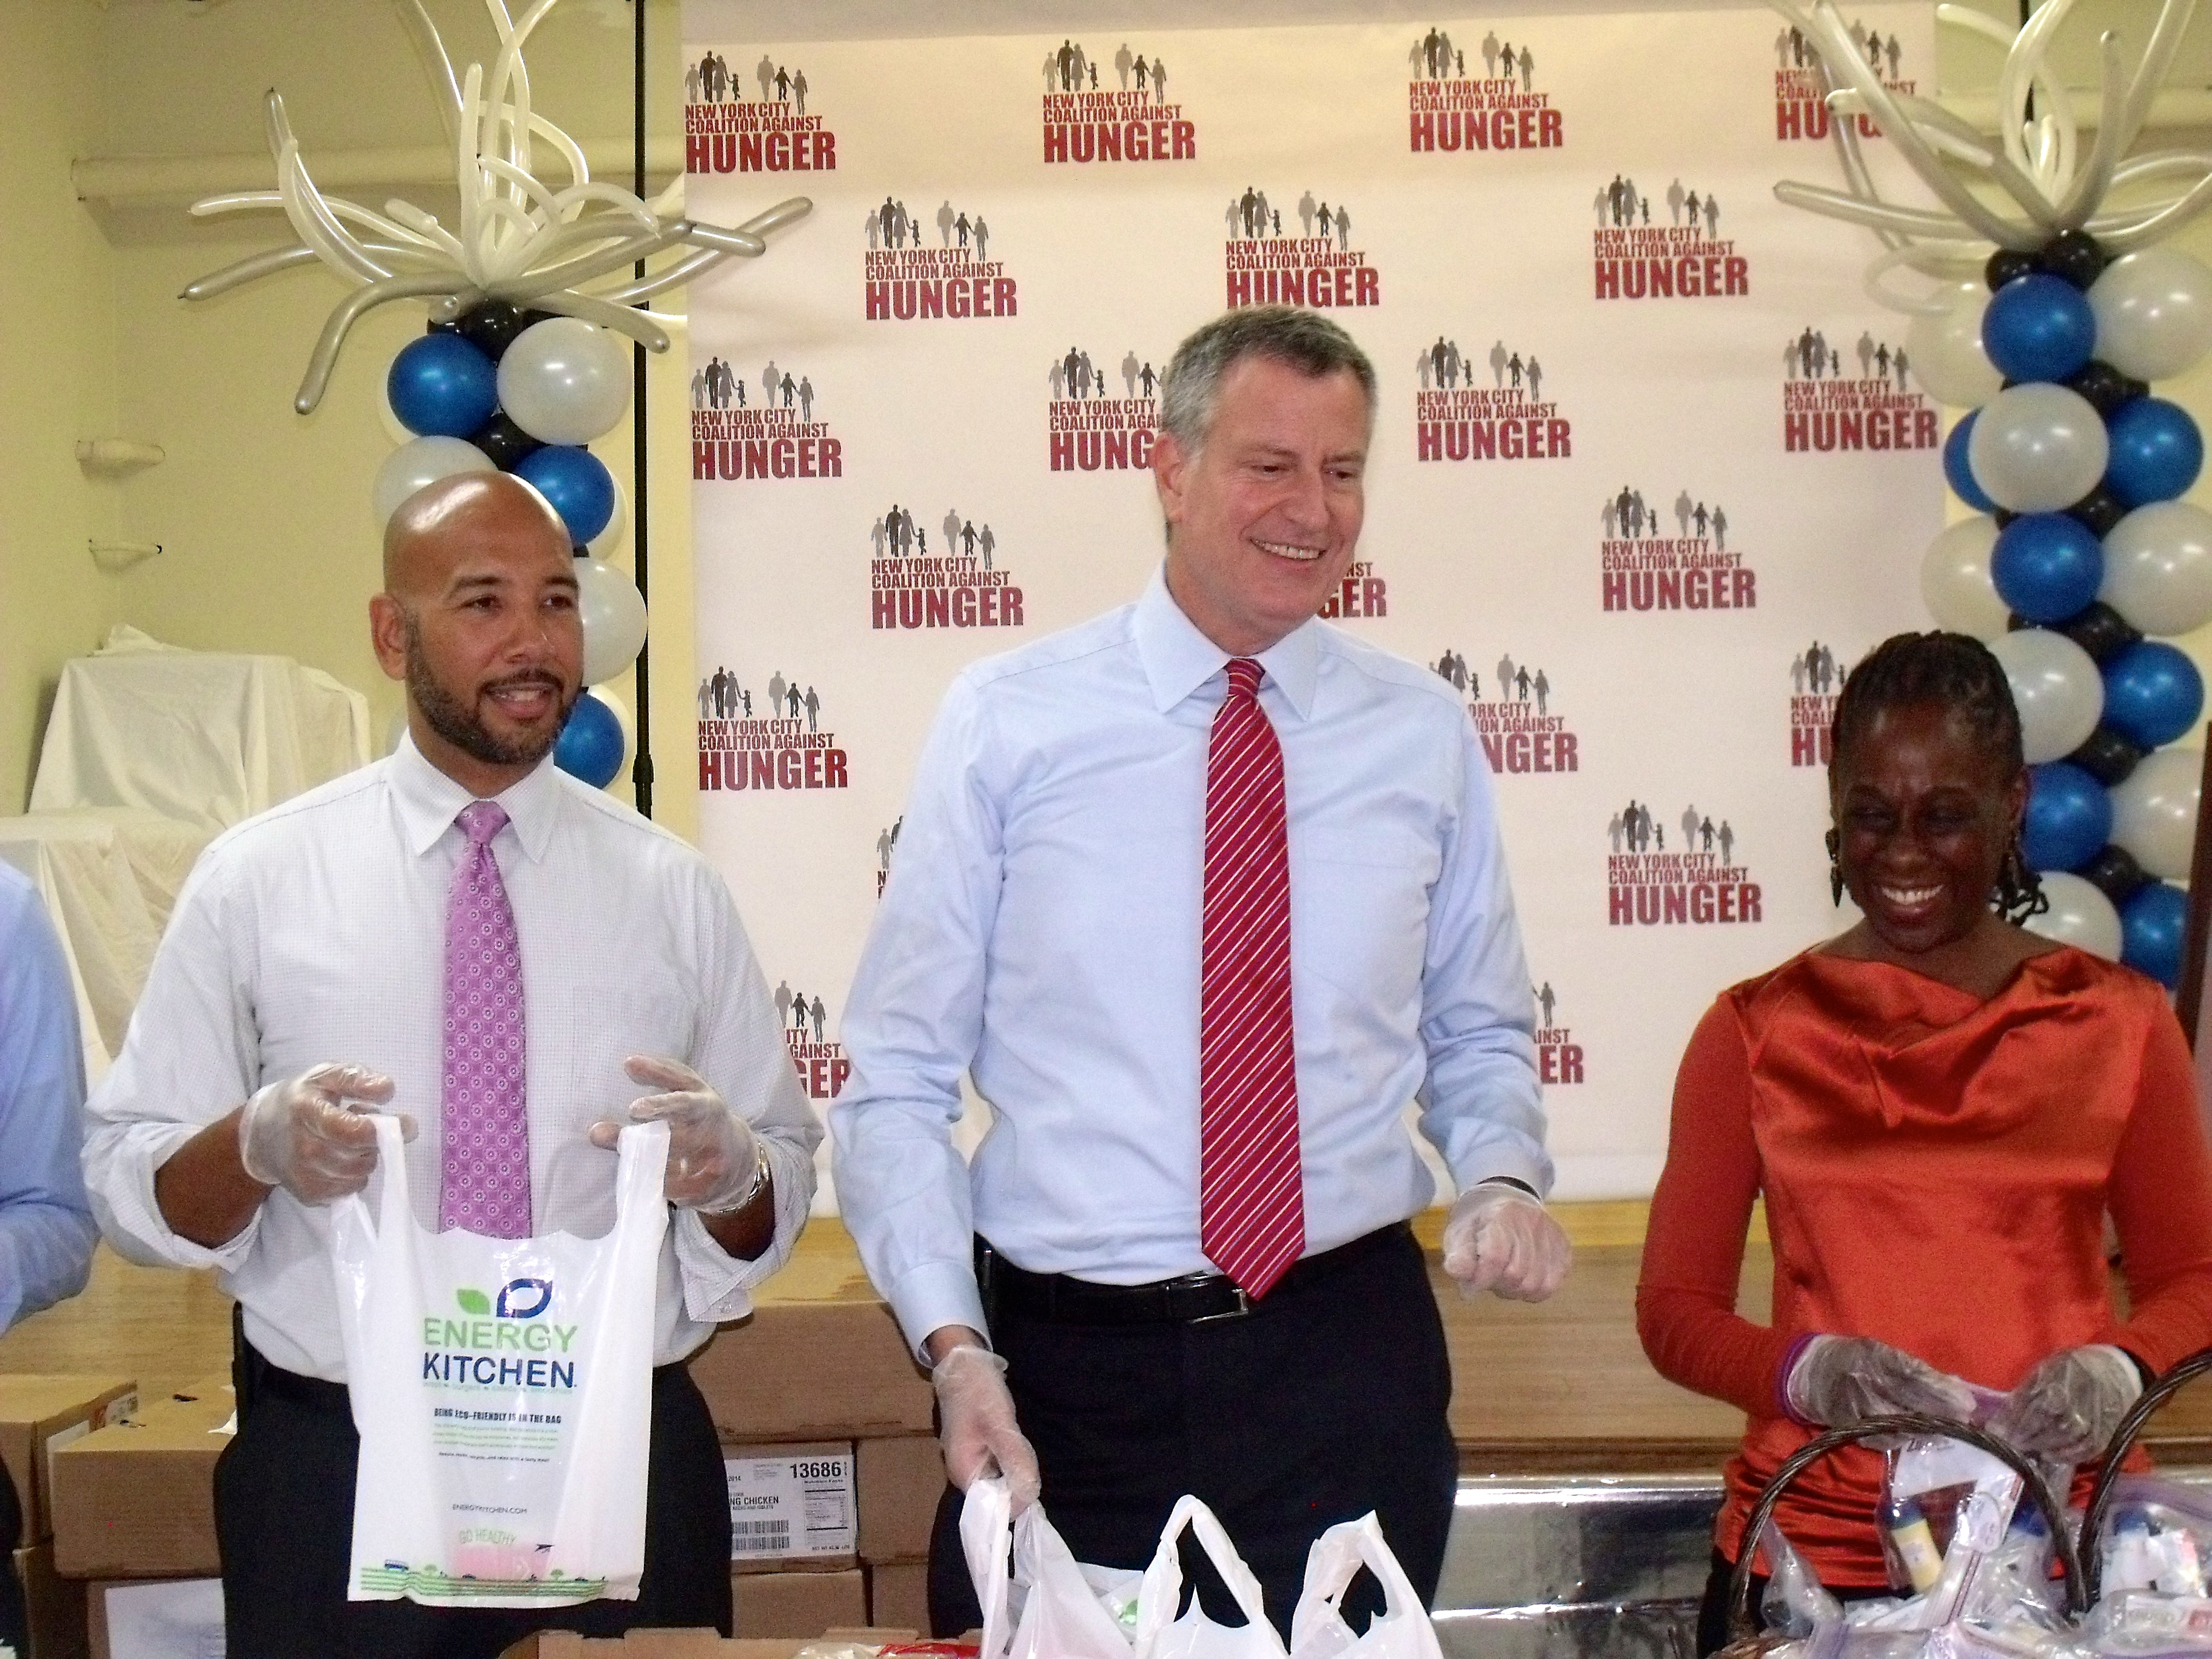 Bronx Borough President Ruben Diaz Jr., Mayor Bill de Blasio, and his wife Chirlane McCray hand out food at a Bronx food pantry this week. (Photo: Jillian Jorgensen)